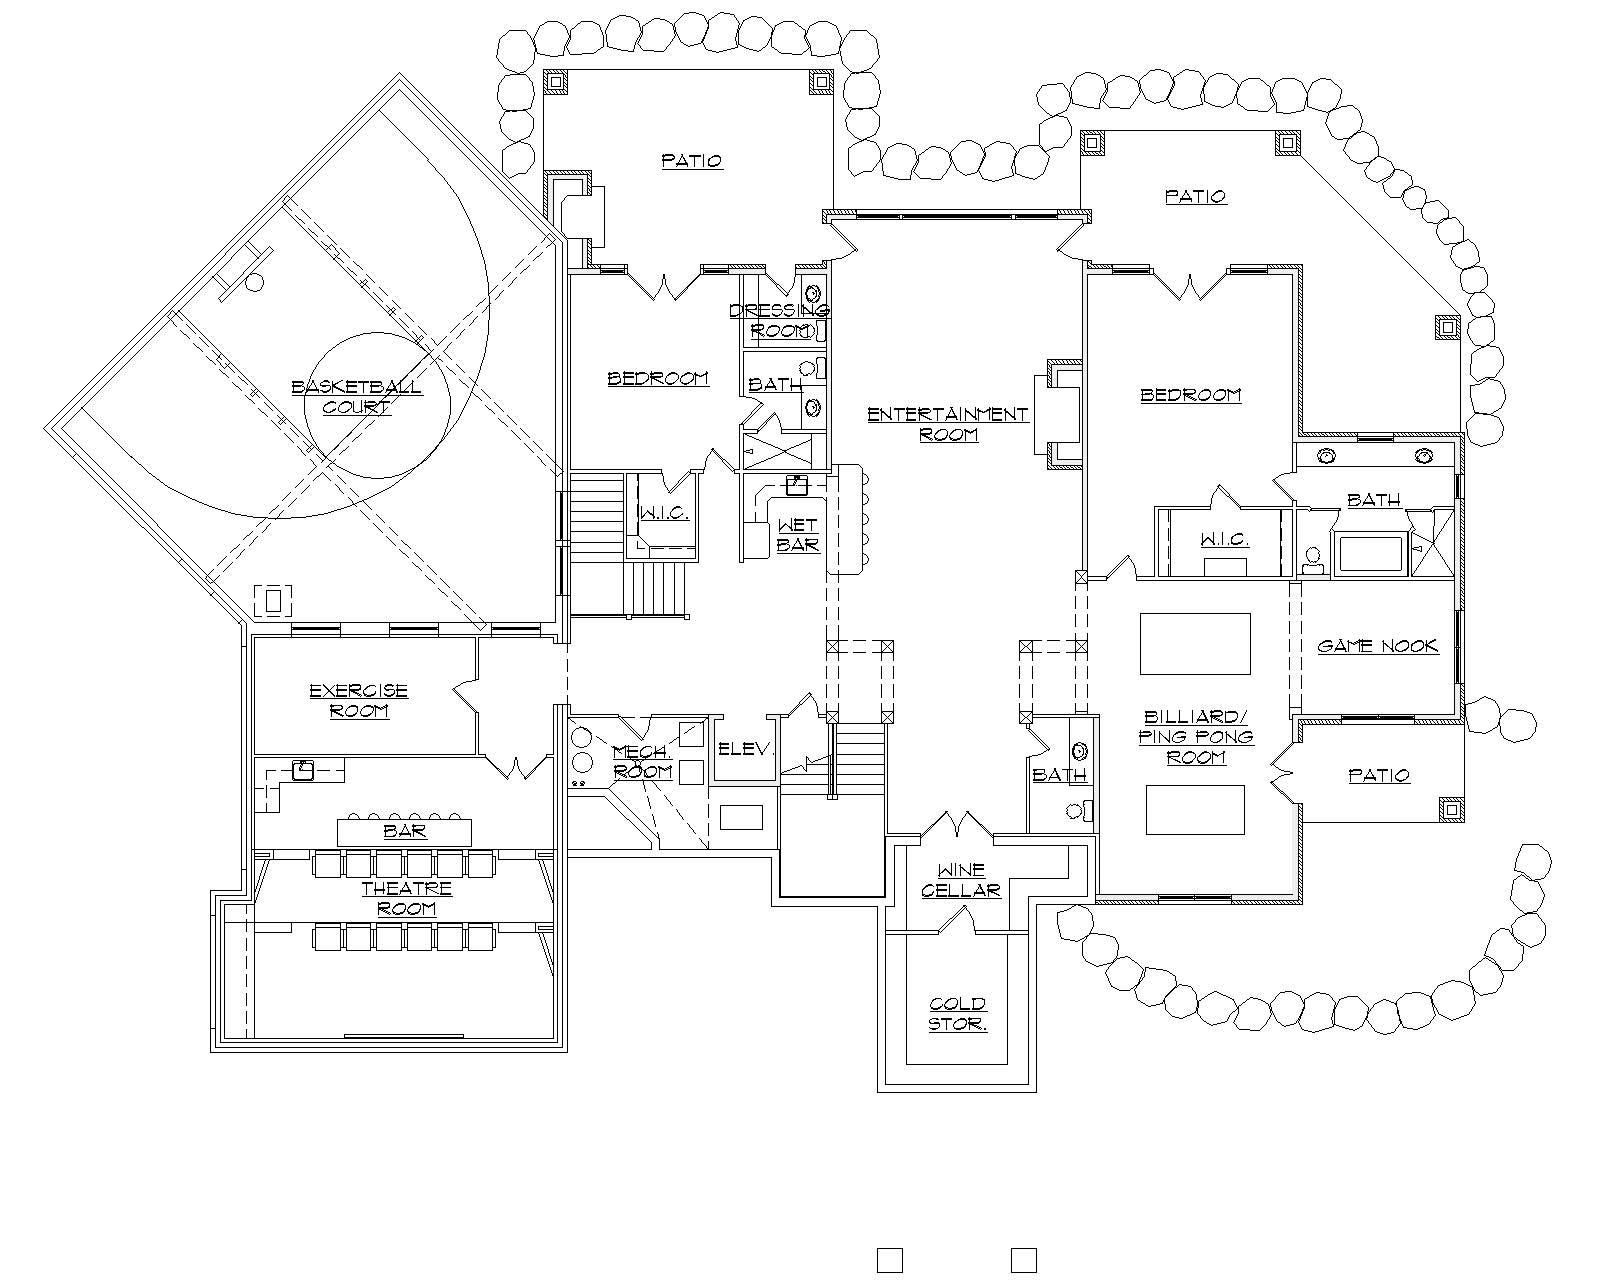 5 Bedroom Craftsman House Plan Luxury Design 135 1036 Indoor Basketball Court Floor Plans Home Basketball Court